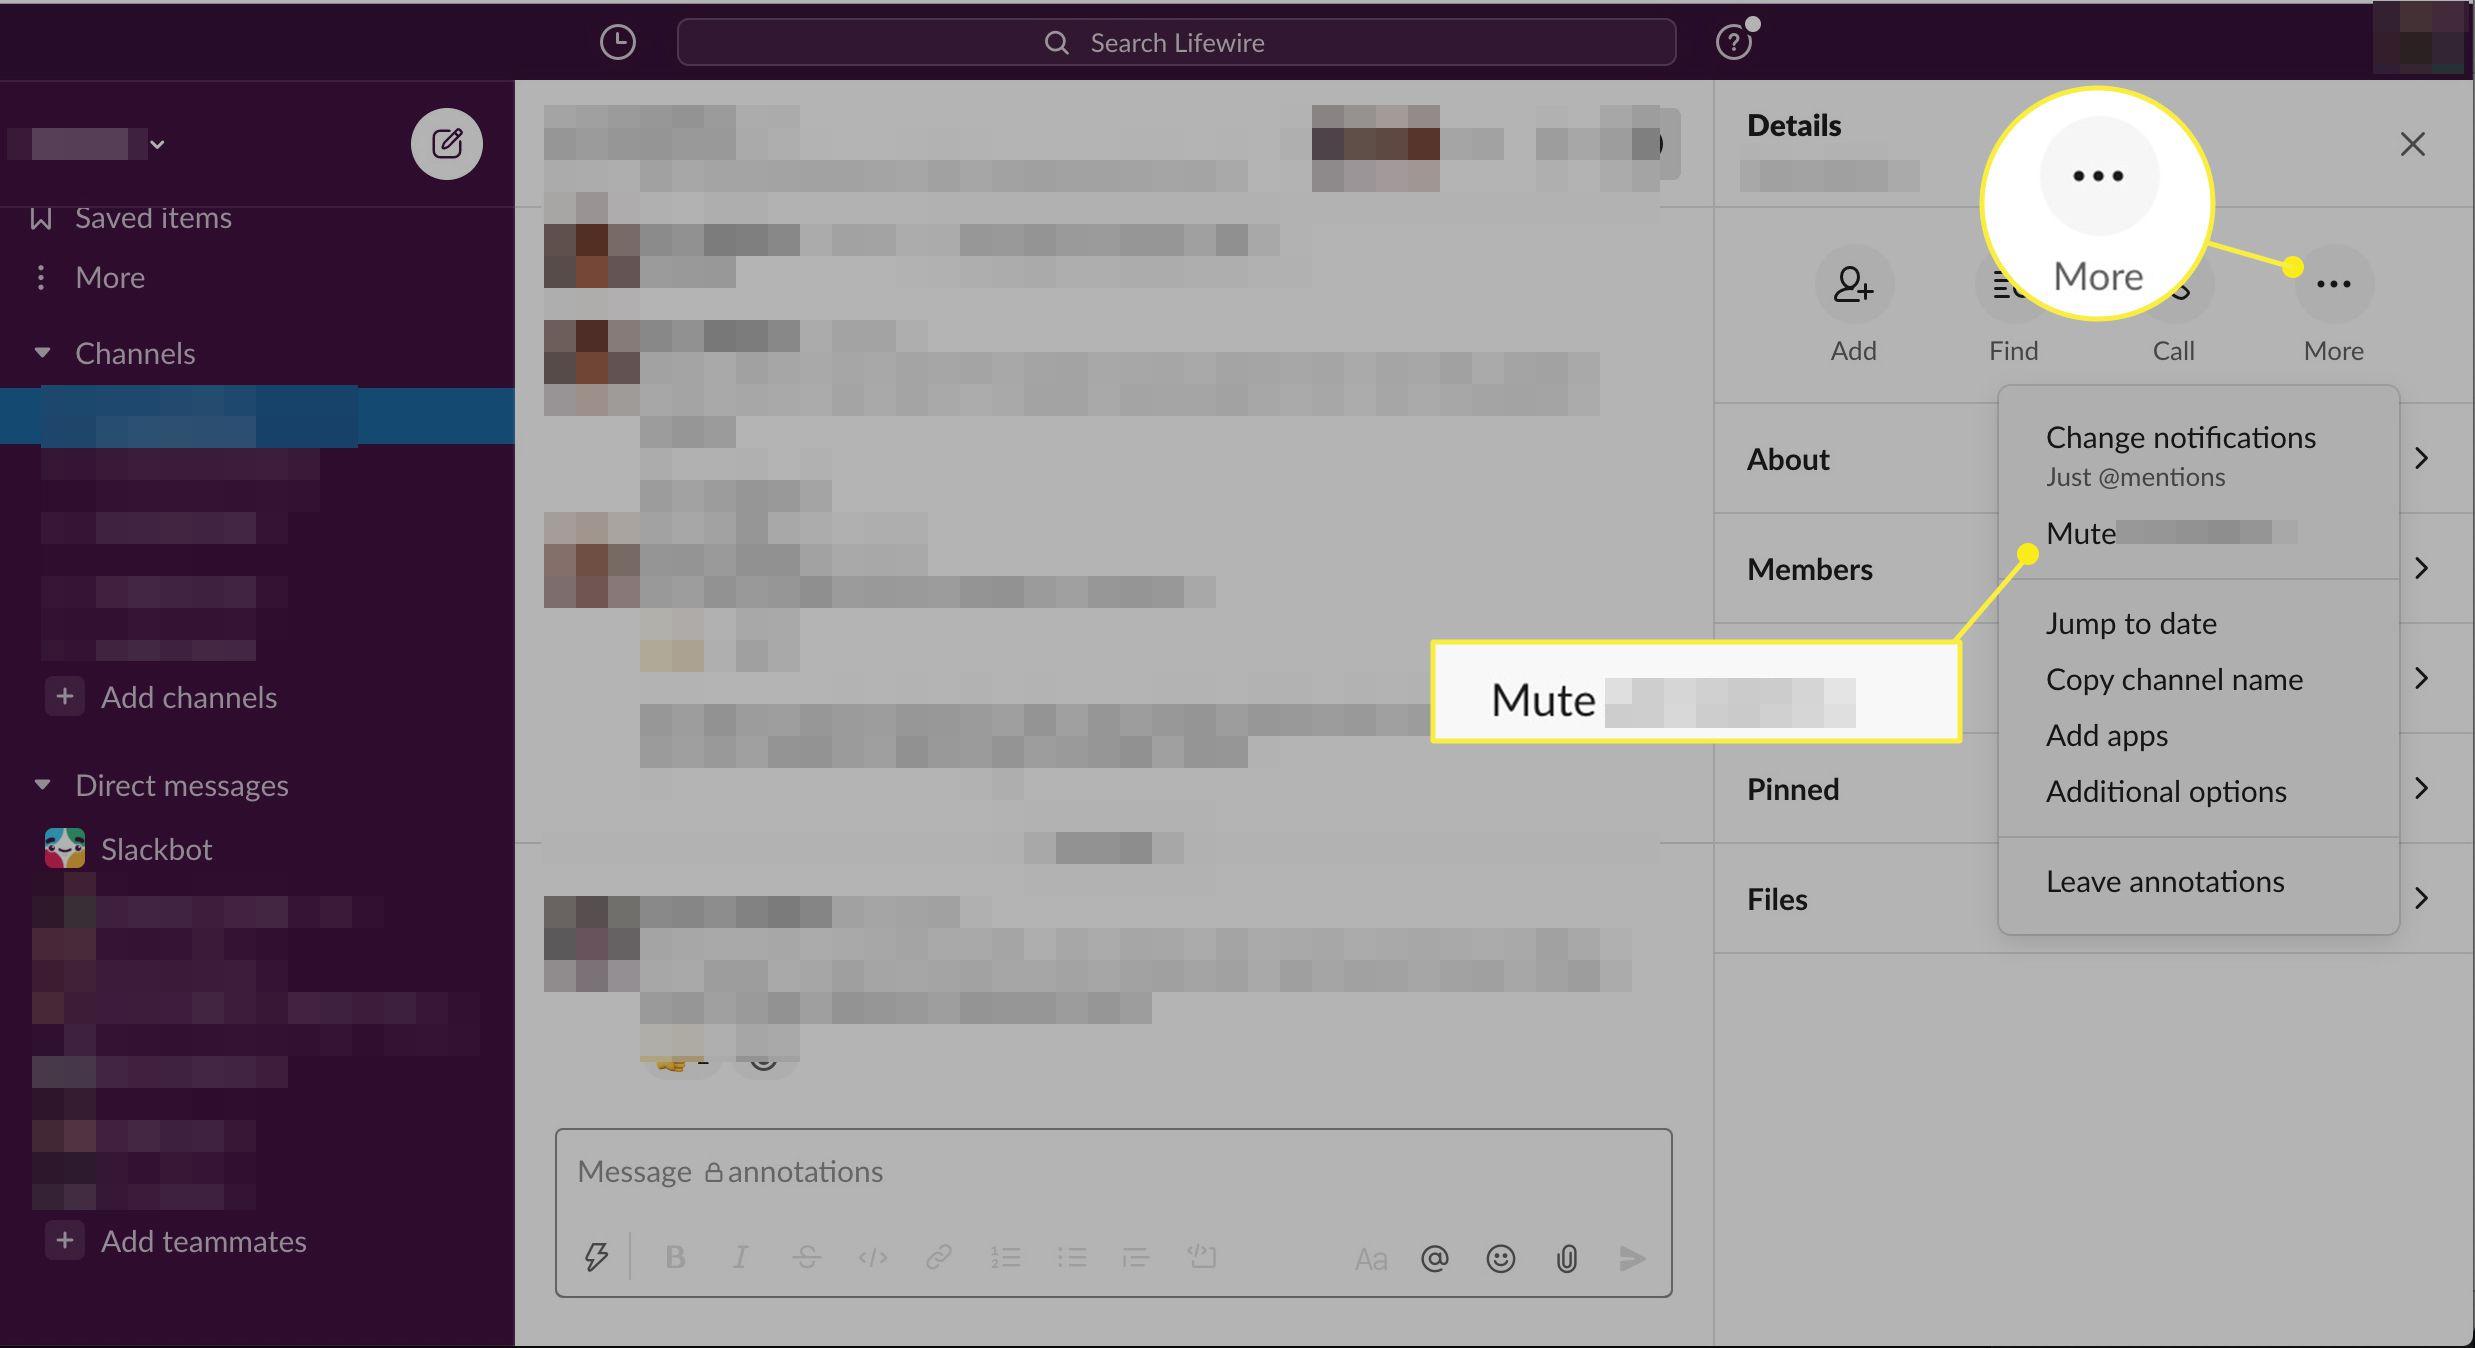 Mute link in menu